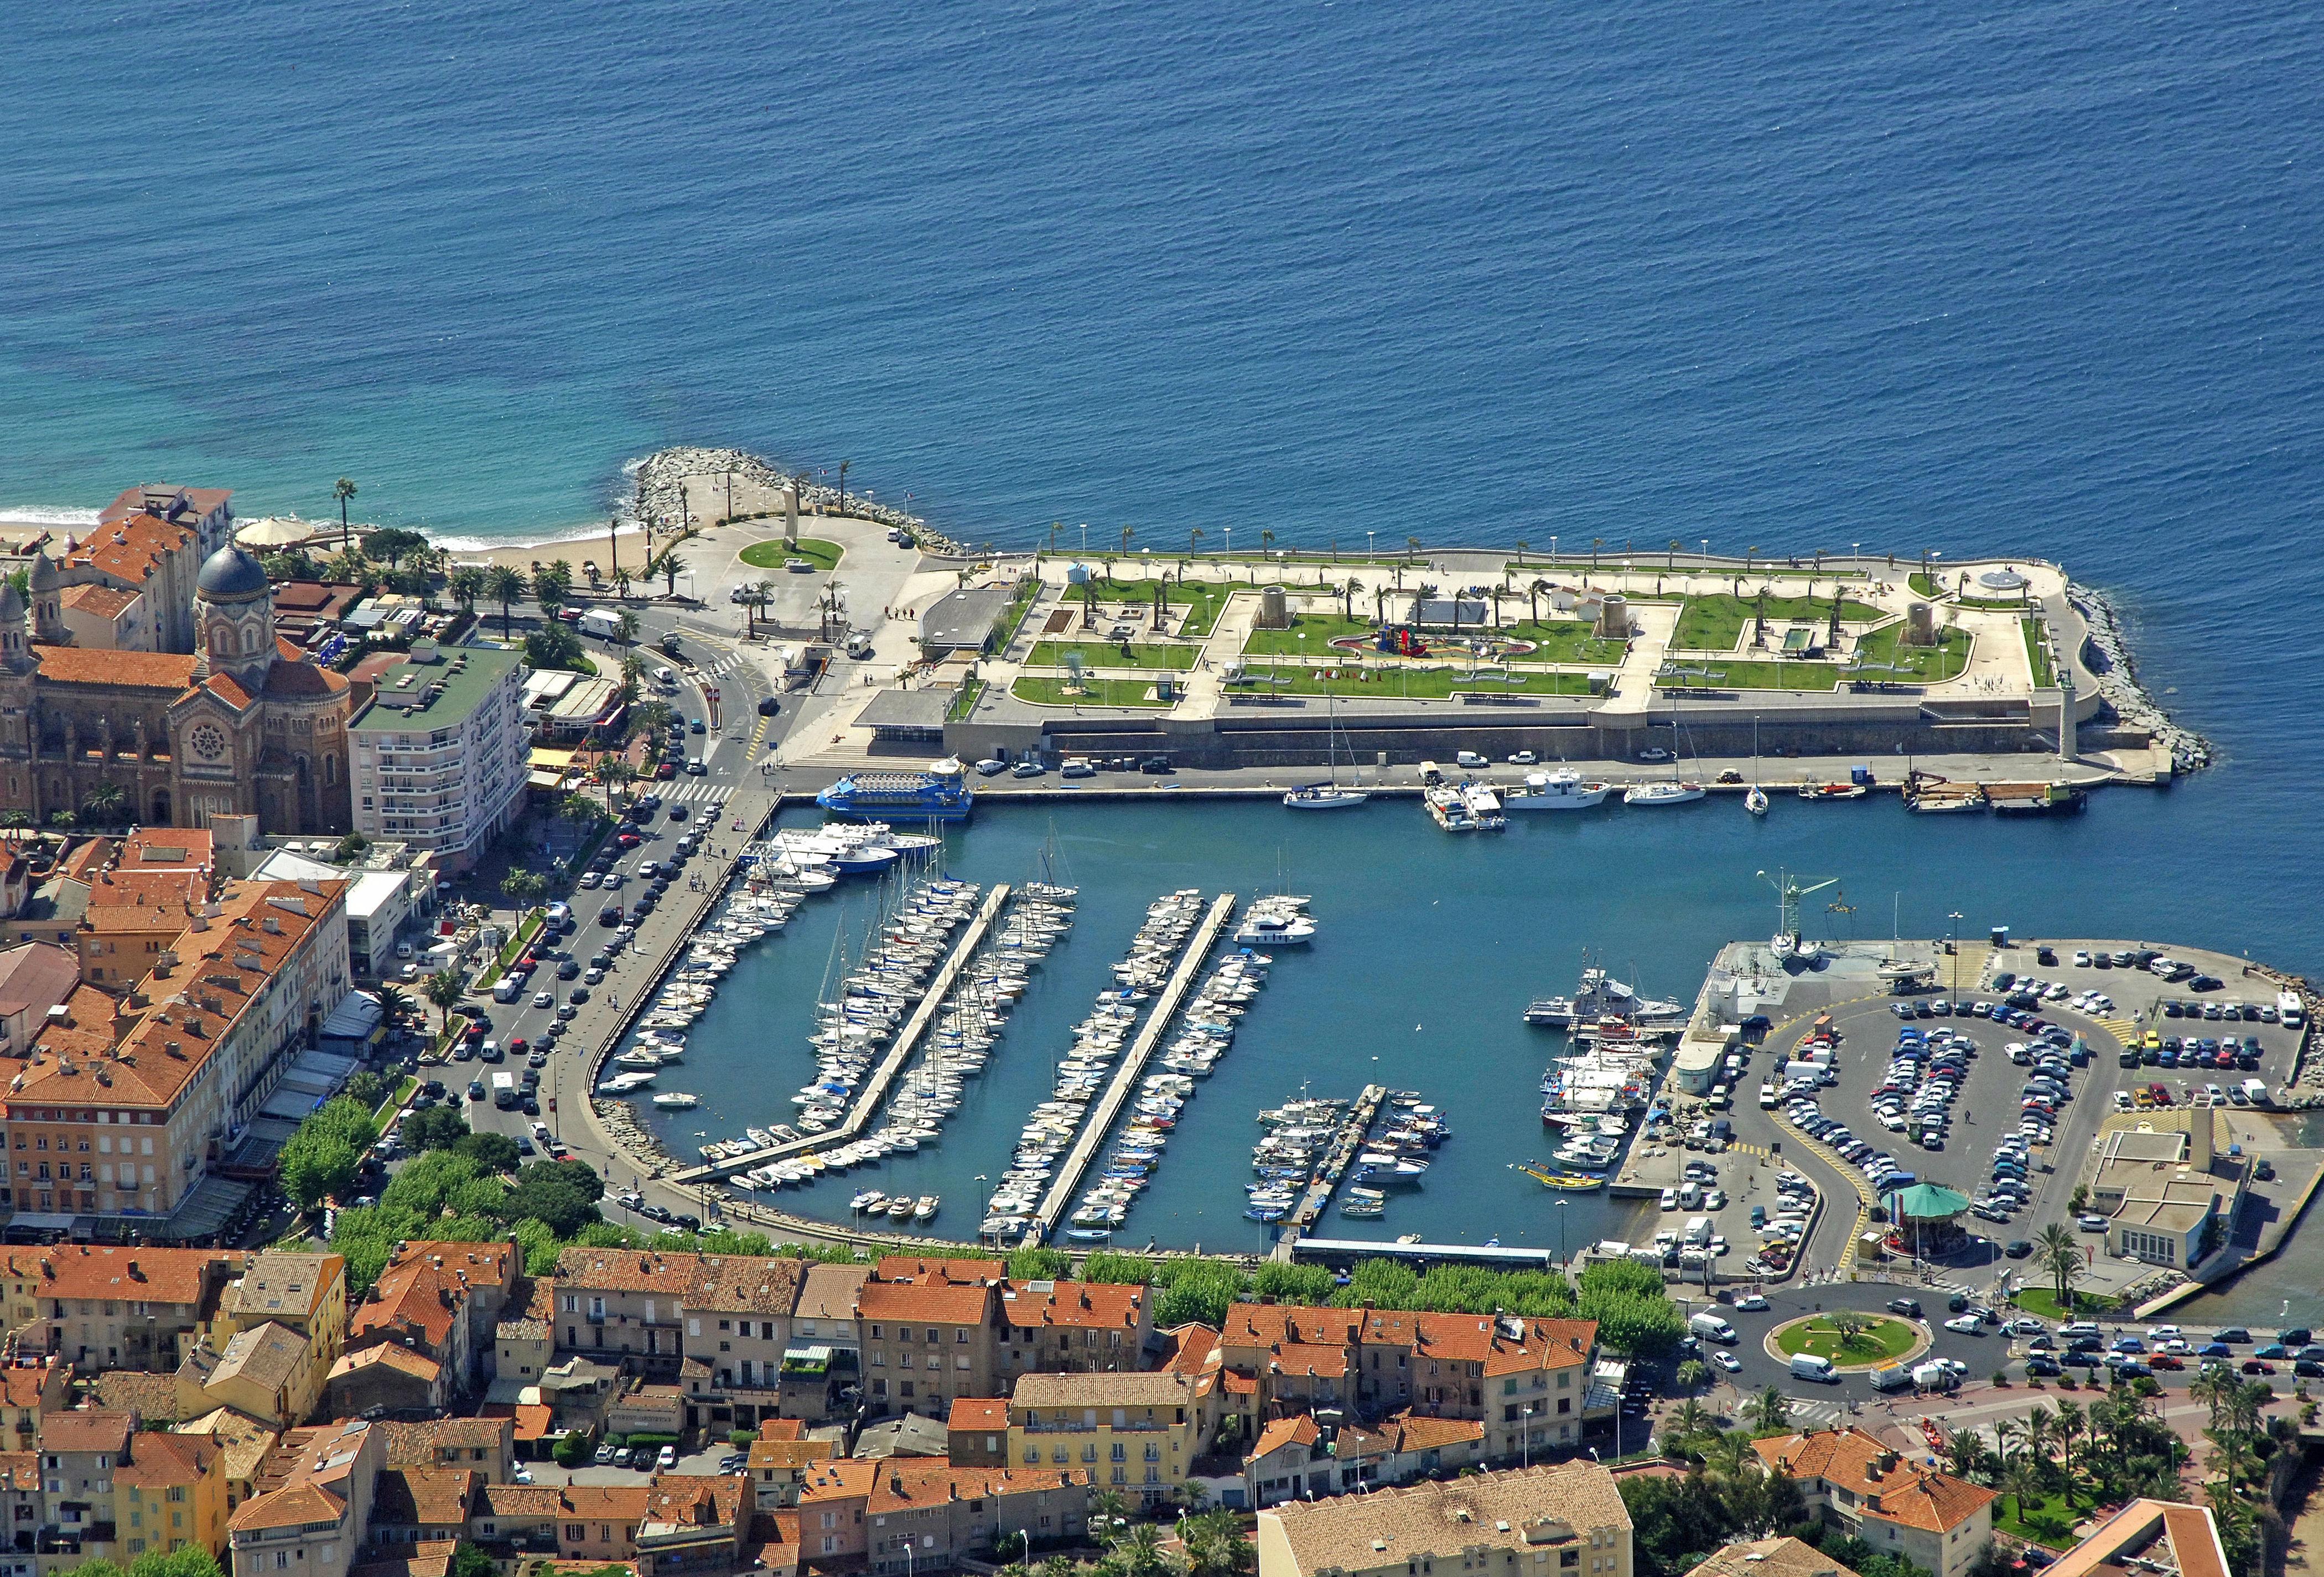 Vieux port st raphael in saint raphael france marina - Restaurant port santa lucia saint raphael ...